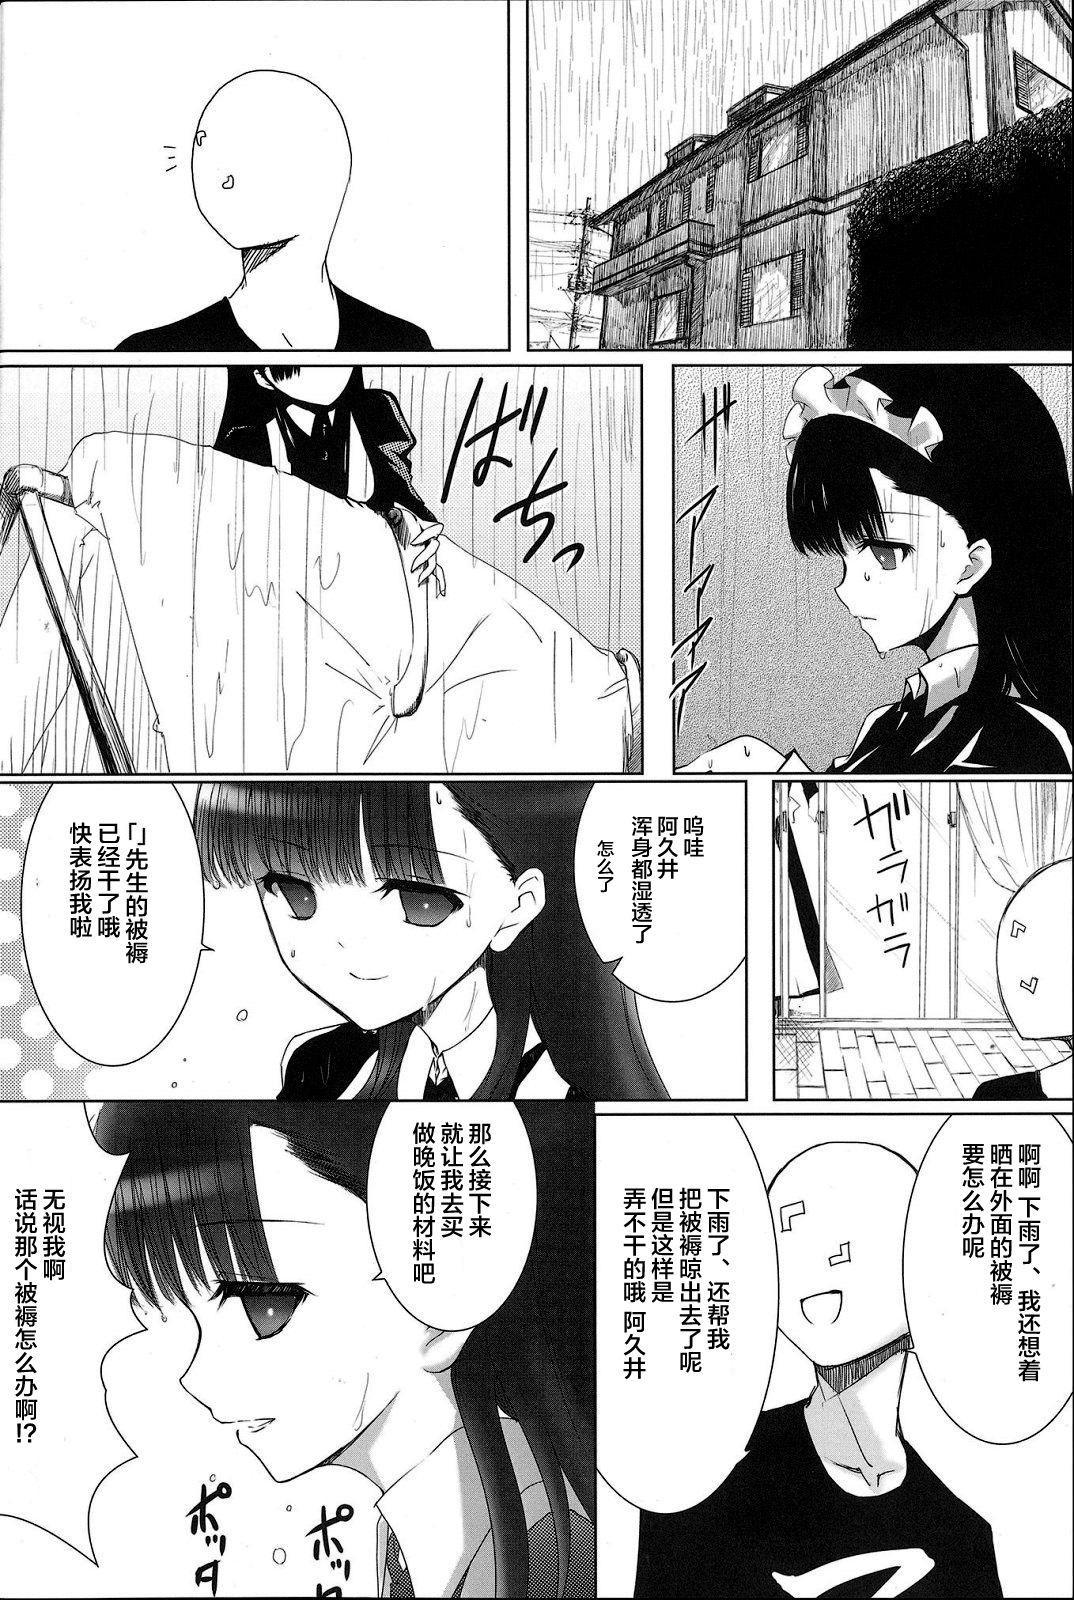 [Heikoushihenkei (Kawanakajima)] Akui-san ga Kaze hi-ta 1 [Chinese] [lolipoi汉化组] [2014-06-10] 3